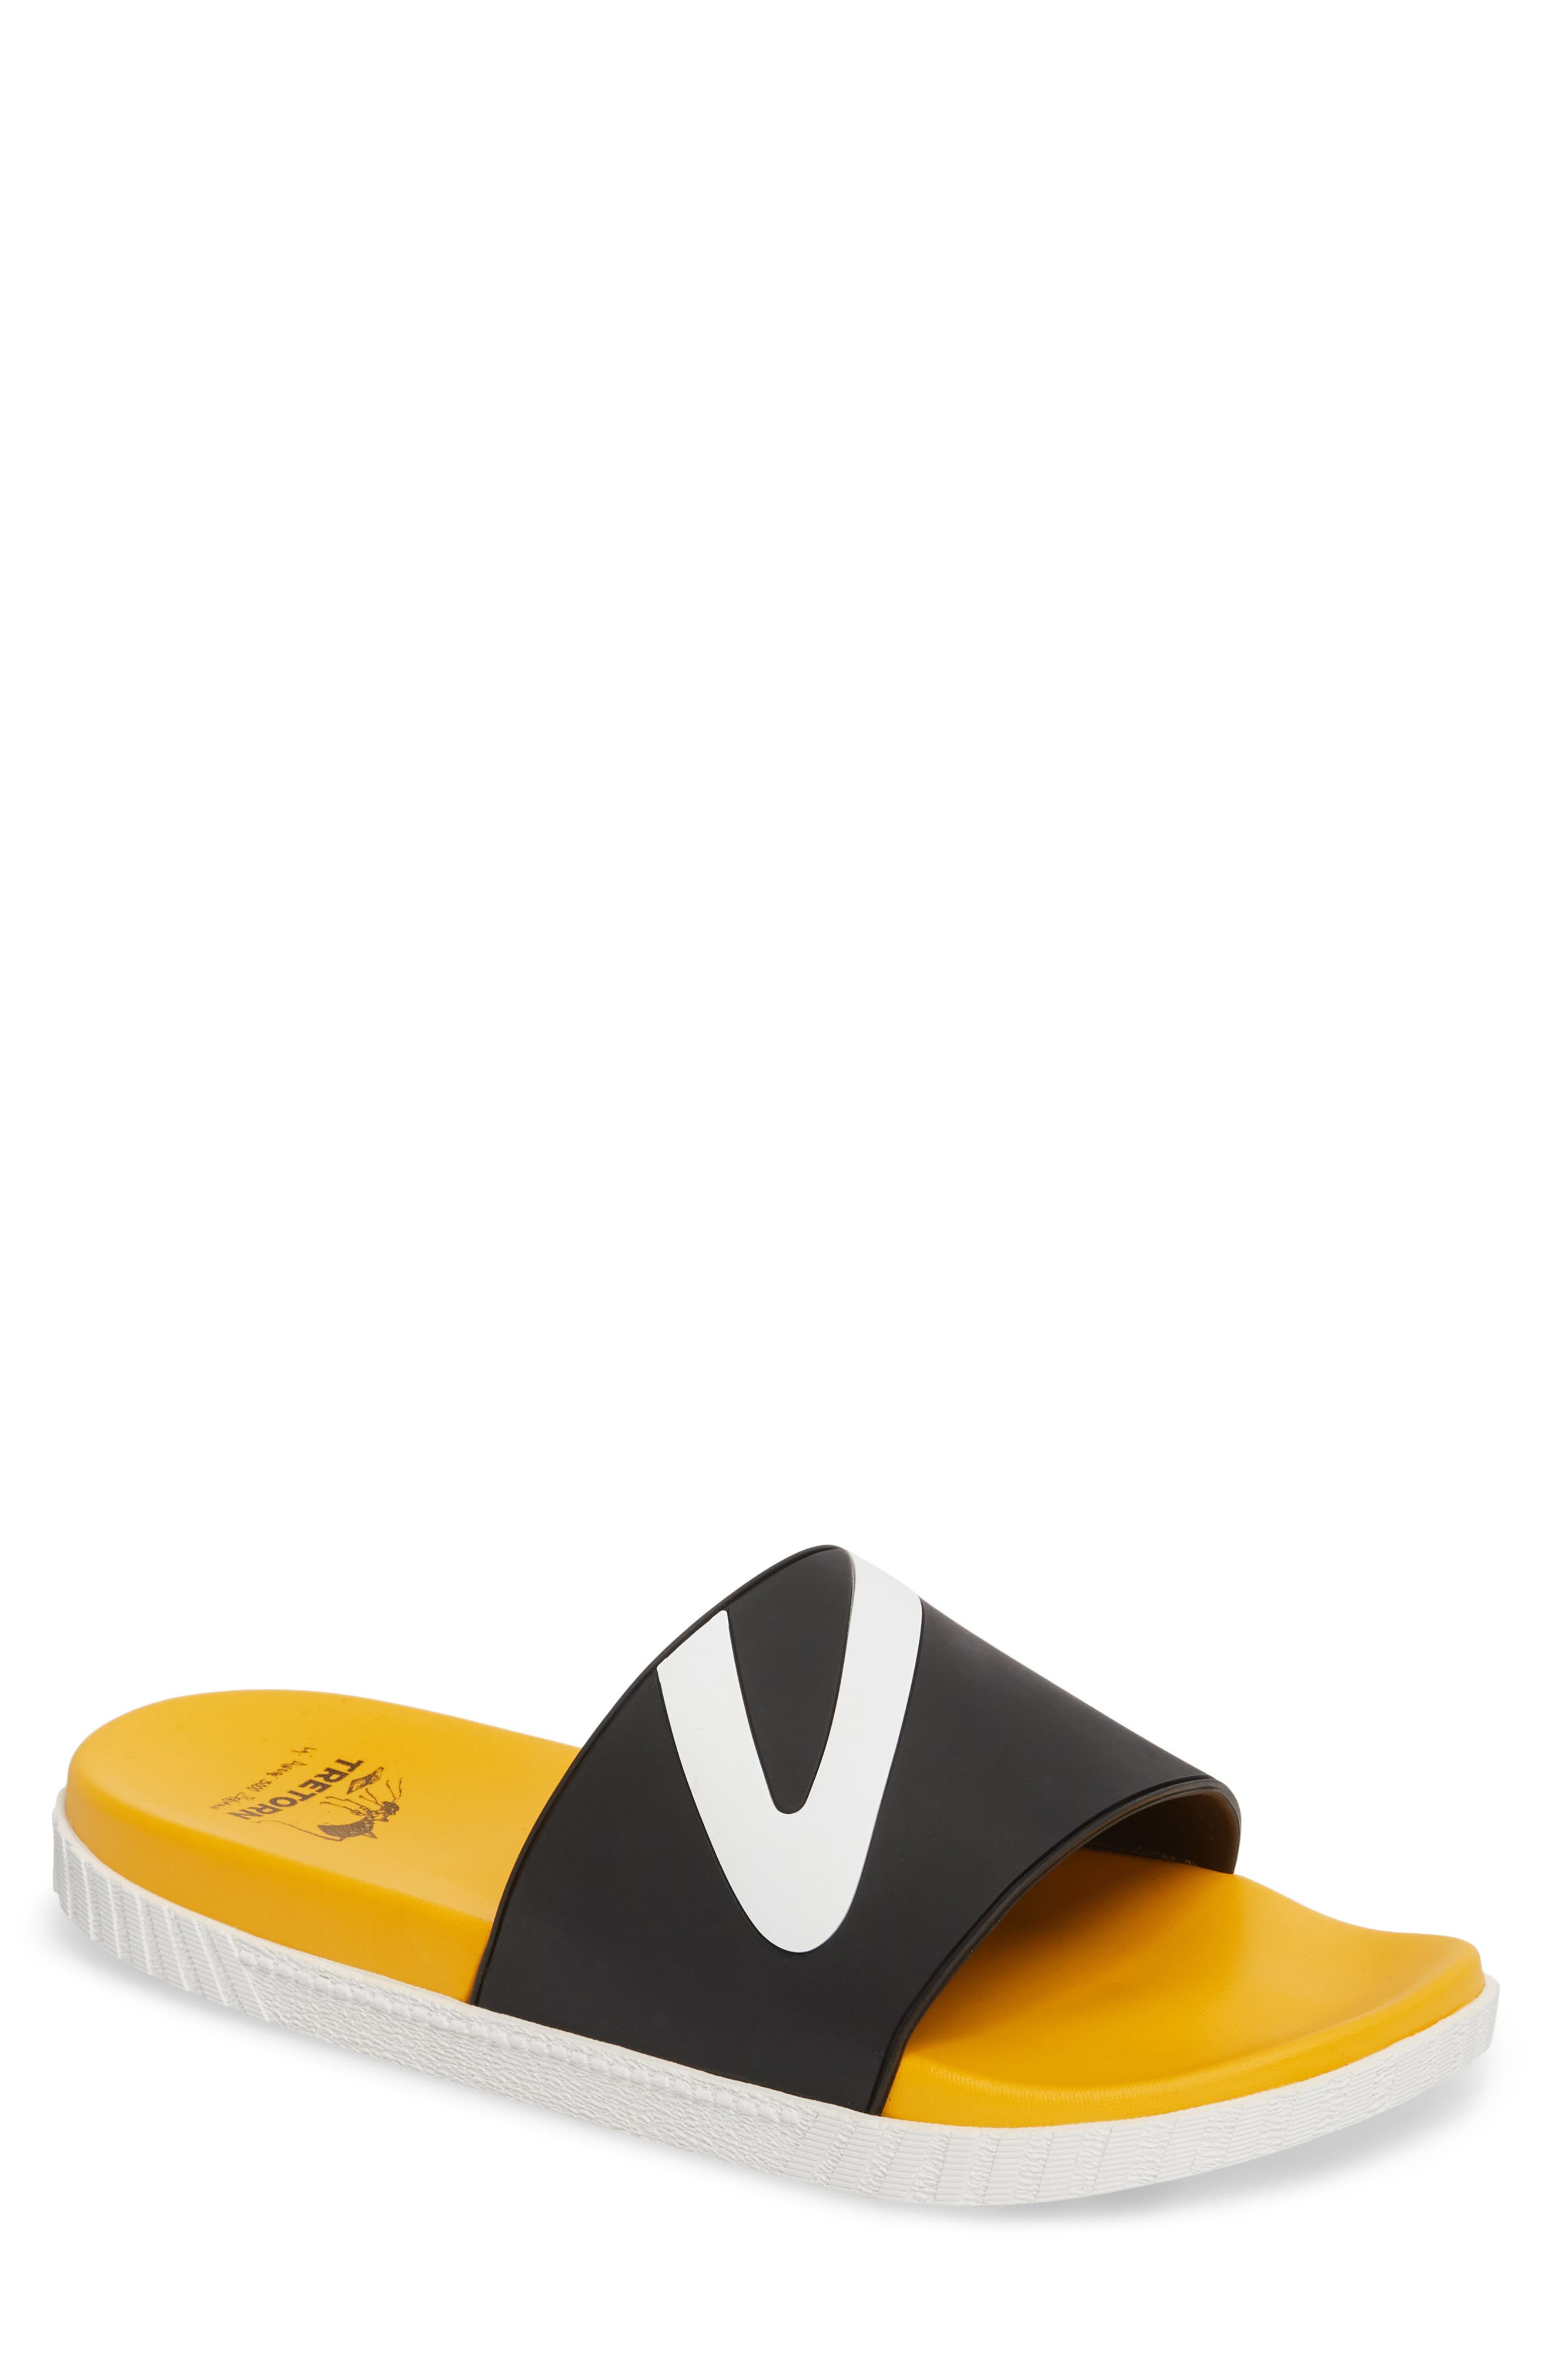 Andre 3000 Slide Sandal,                             Main thumbnail 1, color,                             BLACK